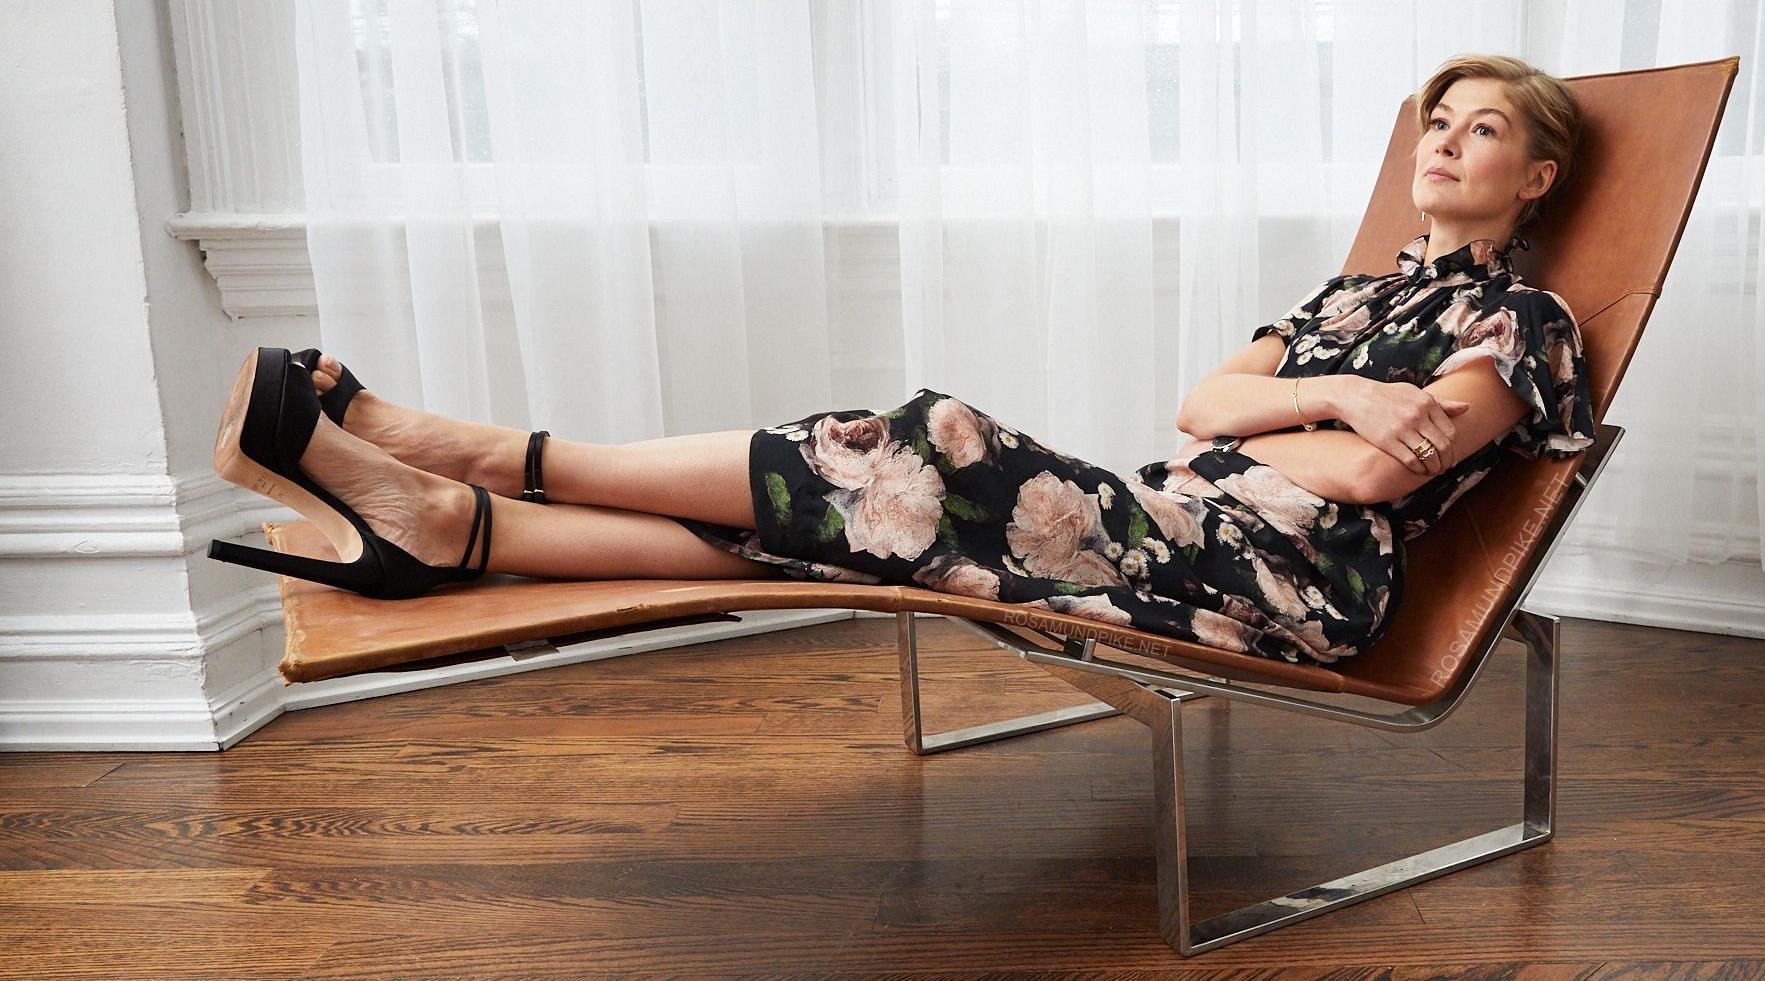 Gif xxx sexy rosamund pike legs trainer naked pornorip